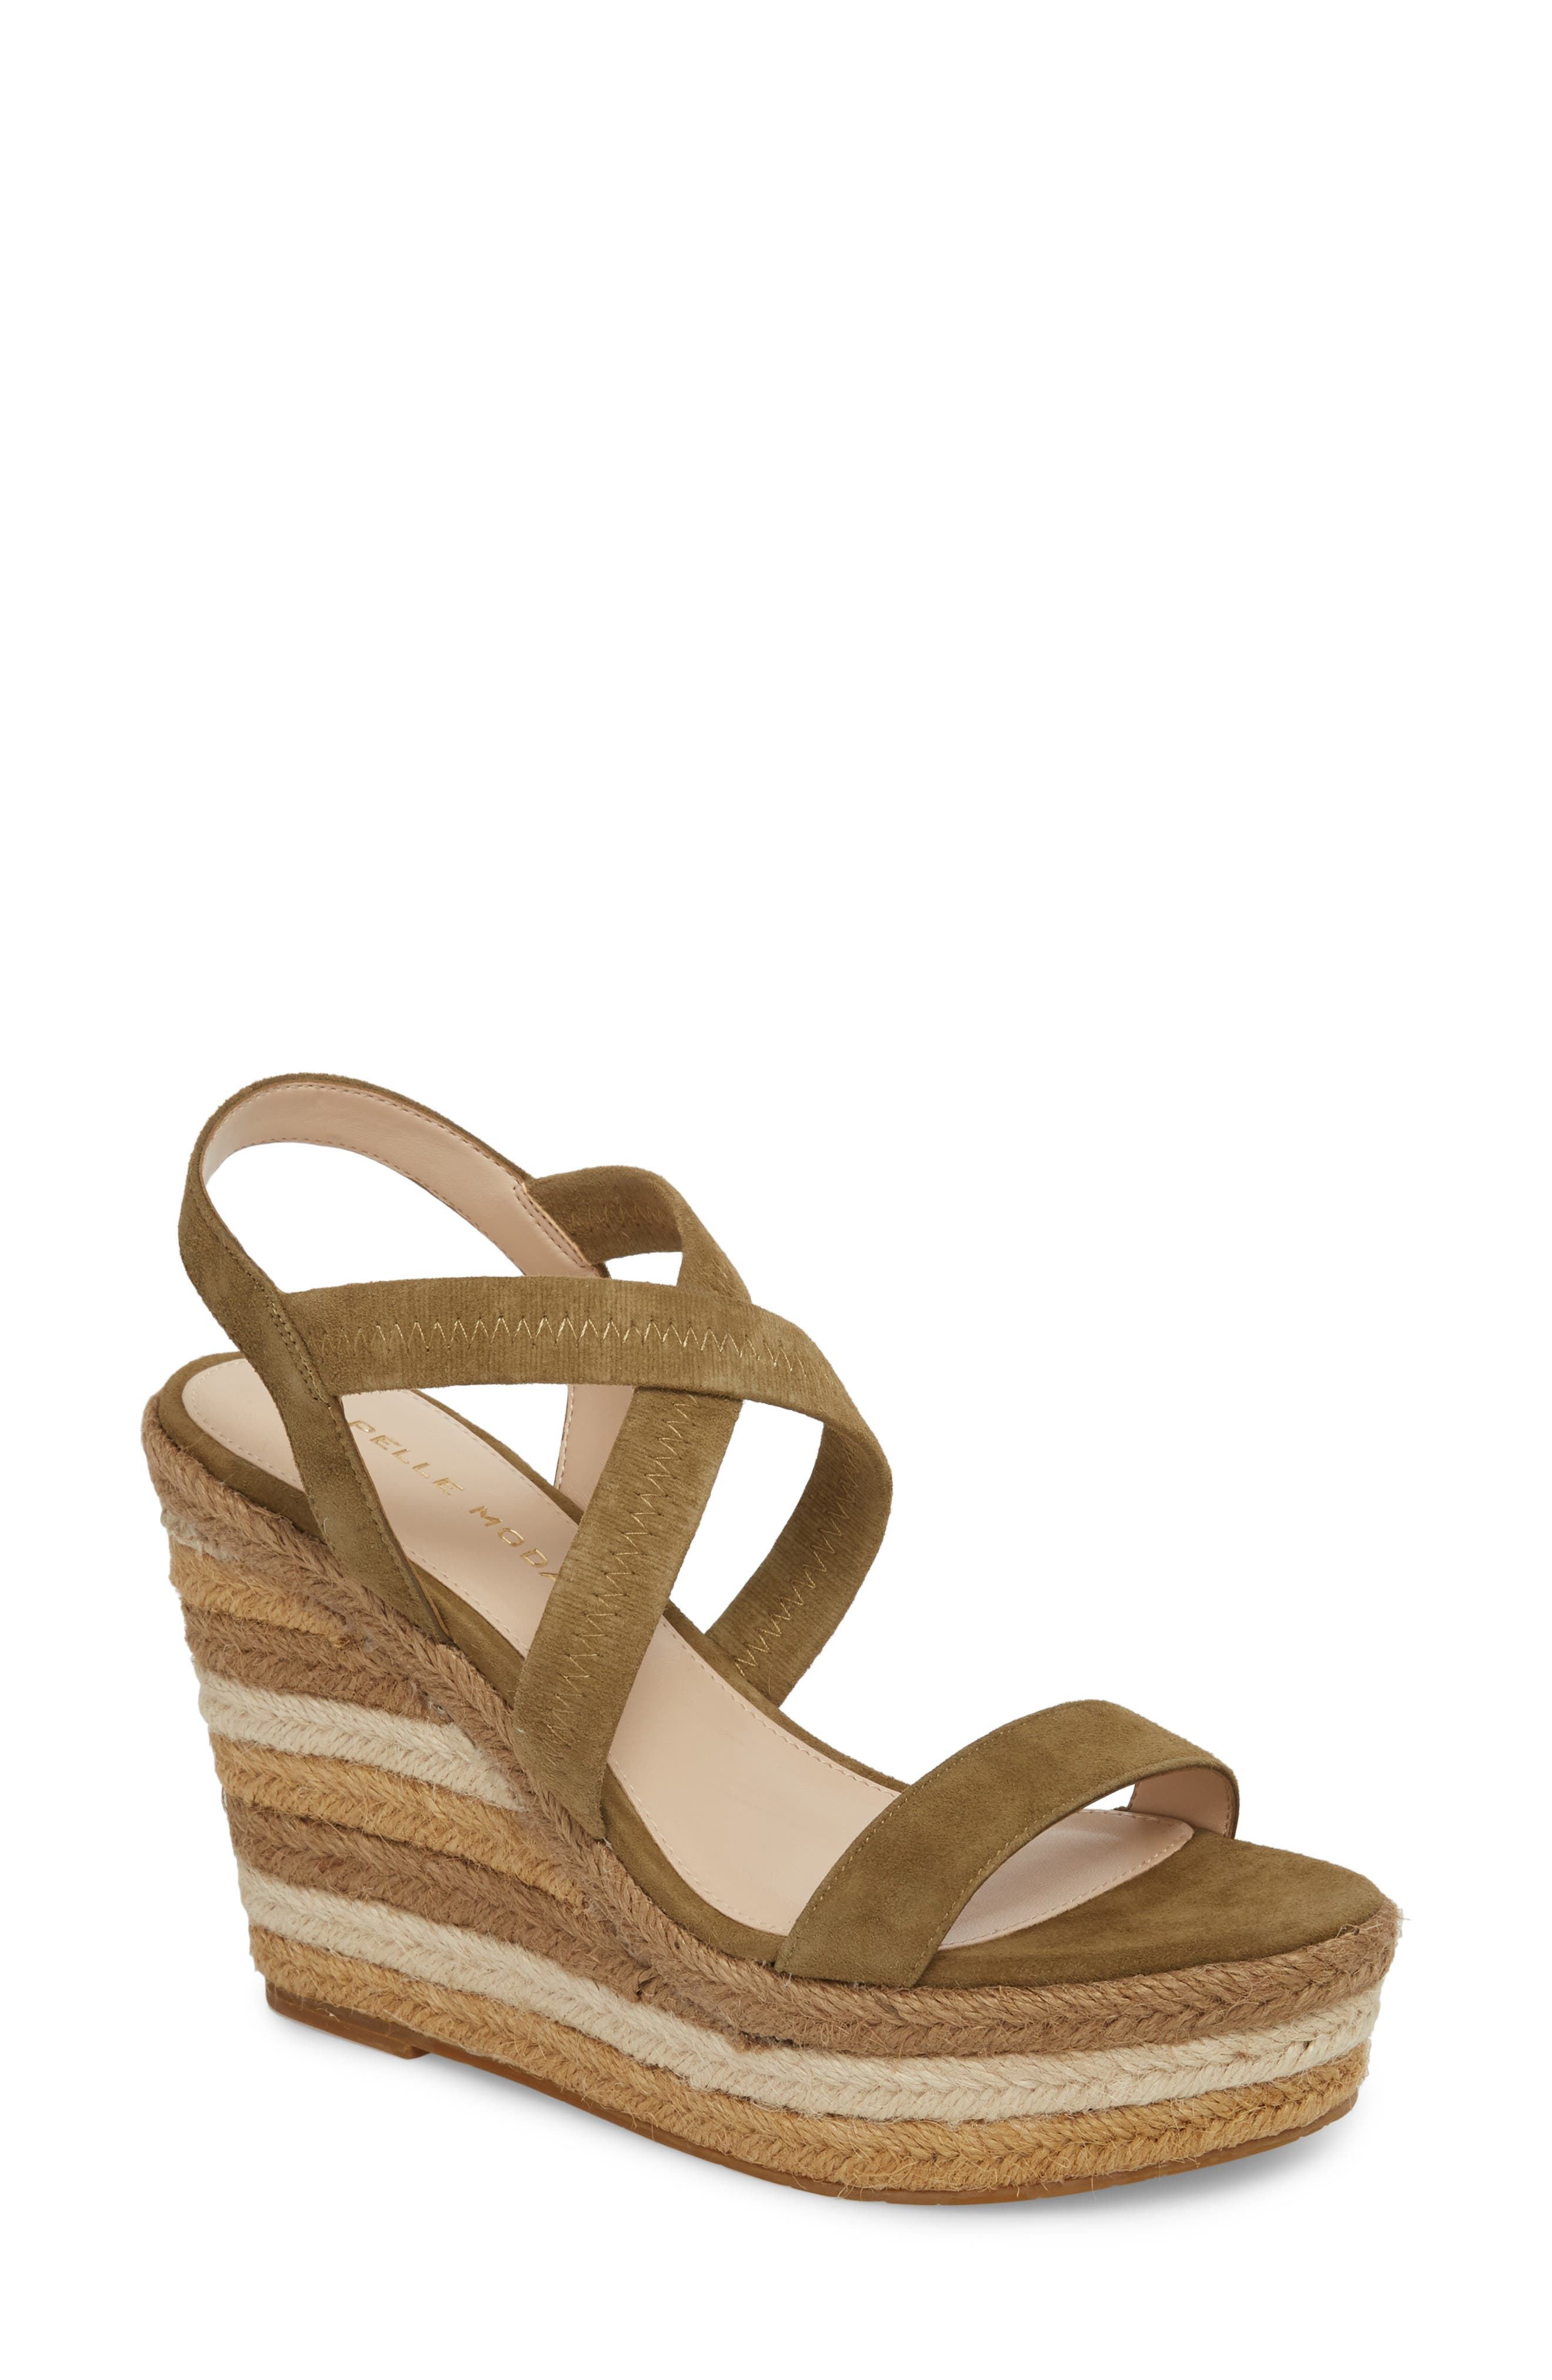 Pelle Moda Raia Espadrille Wedge Sandal (Women)